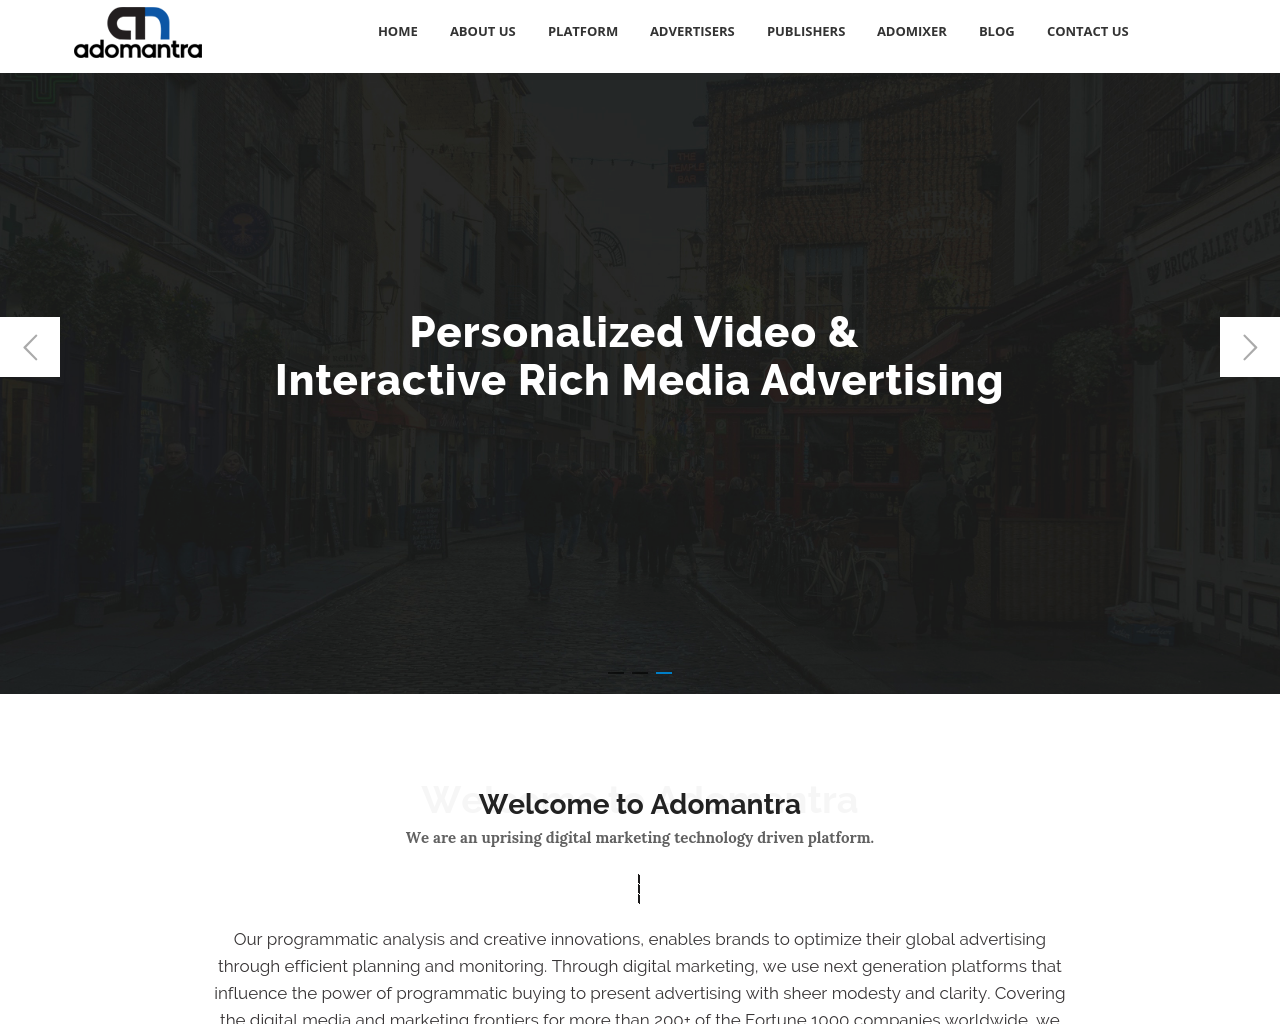 ADOMANTRA-DIGITAL-INDIA-PVT-LTD-Advertising-Reviews-Pricing